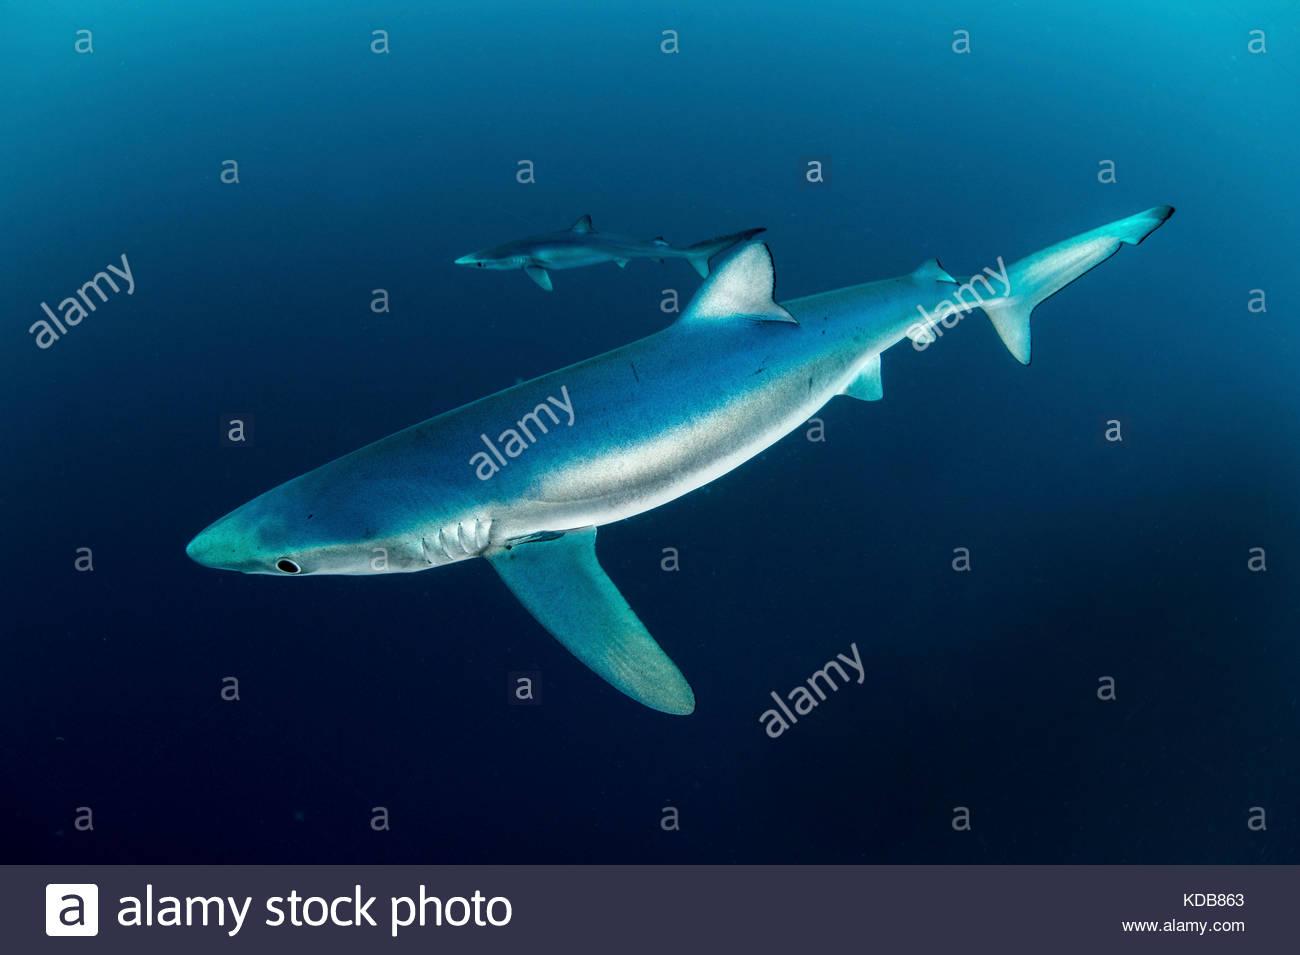 Blue sharks, Prionace glauca. - Stock Image